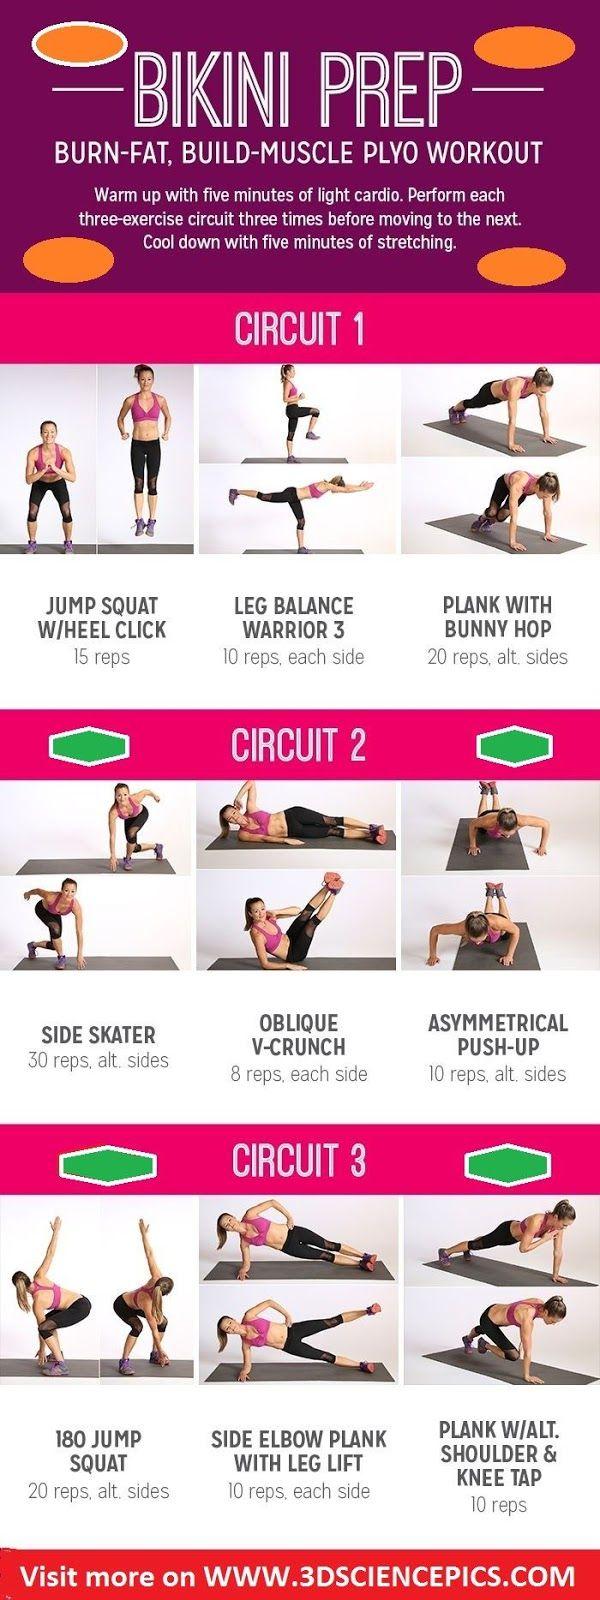 Burn-Fat, Build-Muscle Plyo Workout   Medi Villas